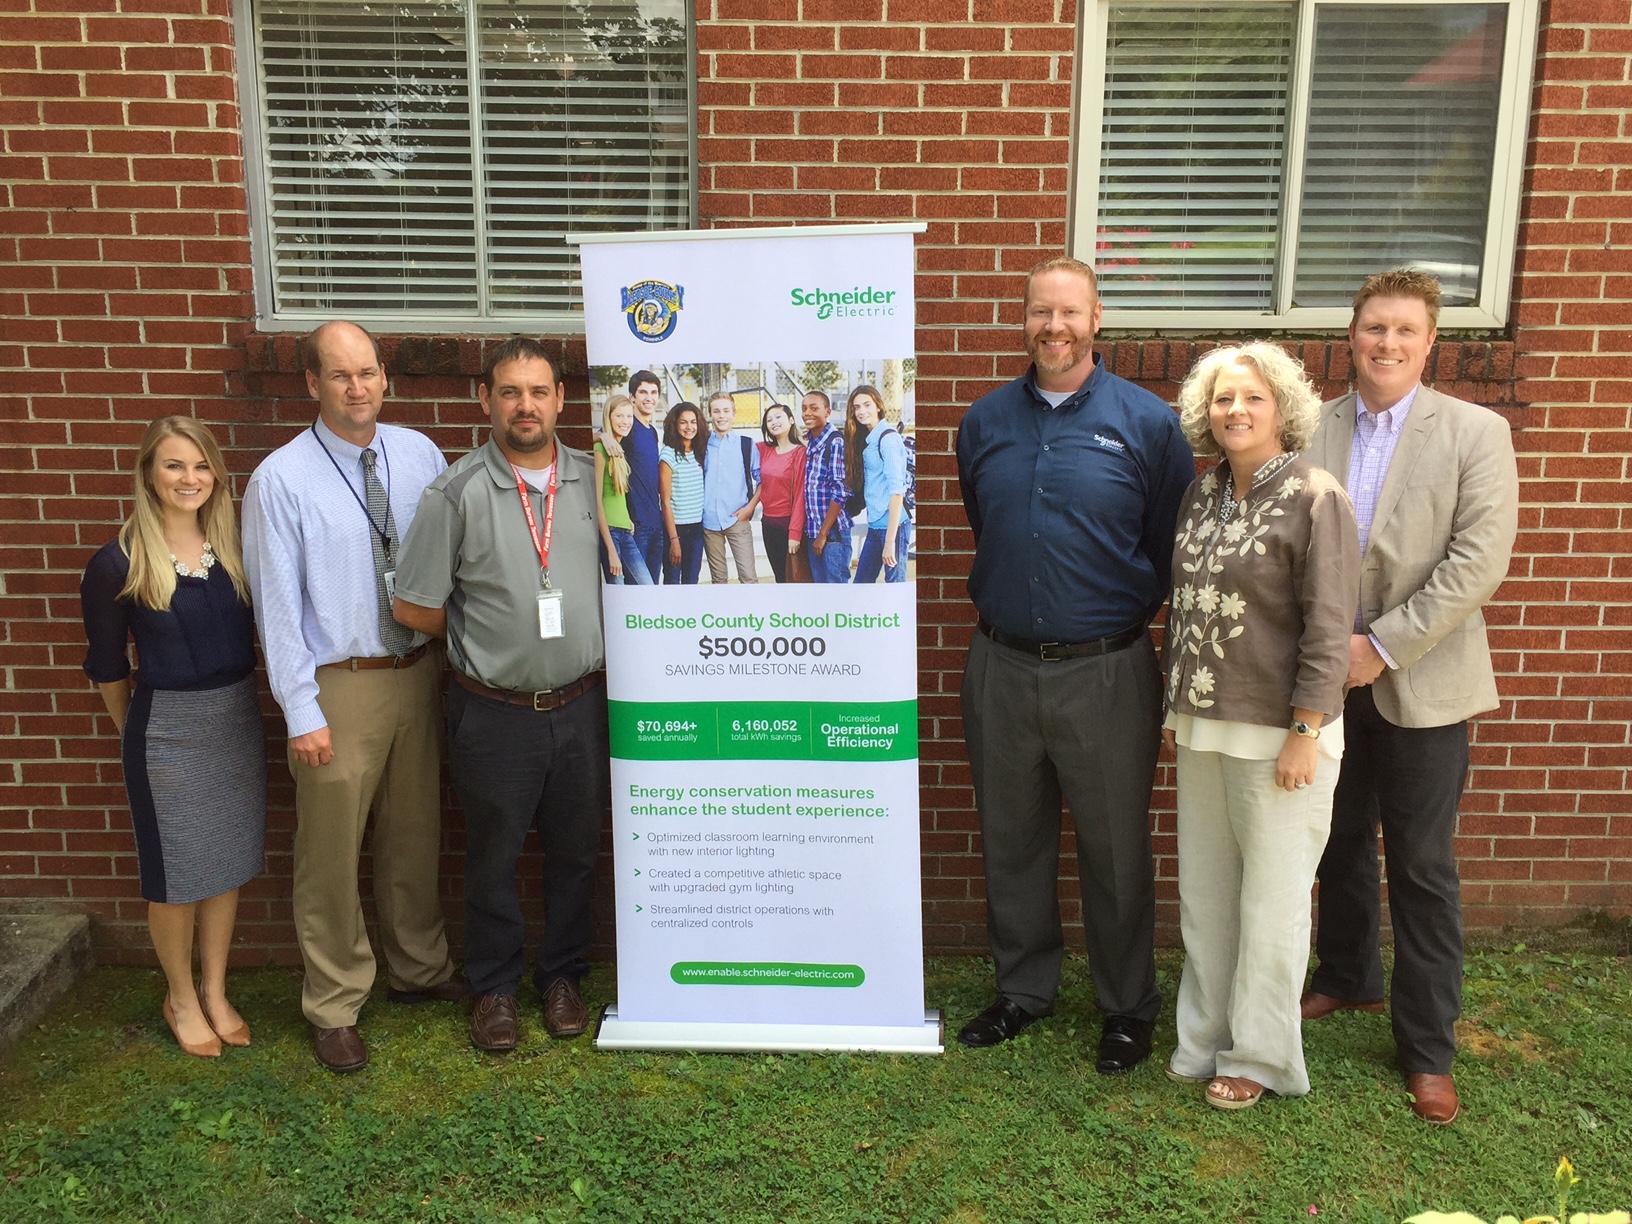 Bledsoe County Schools Reaches $500,000 Energy Savings